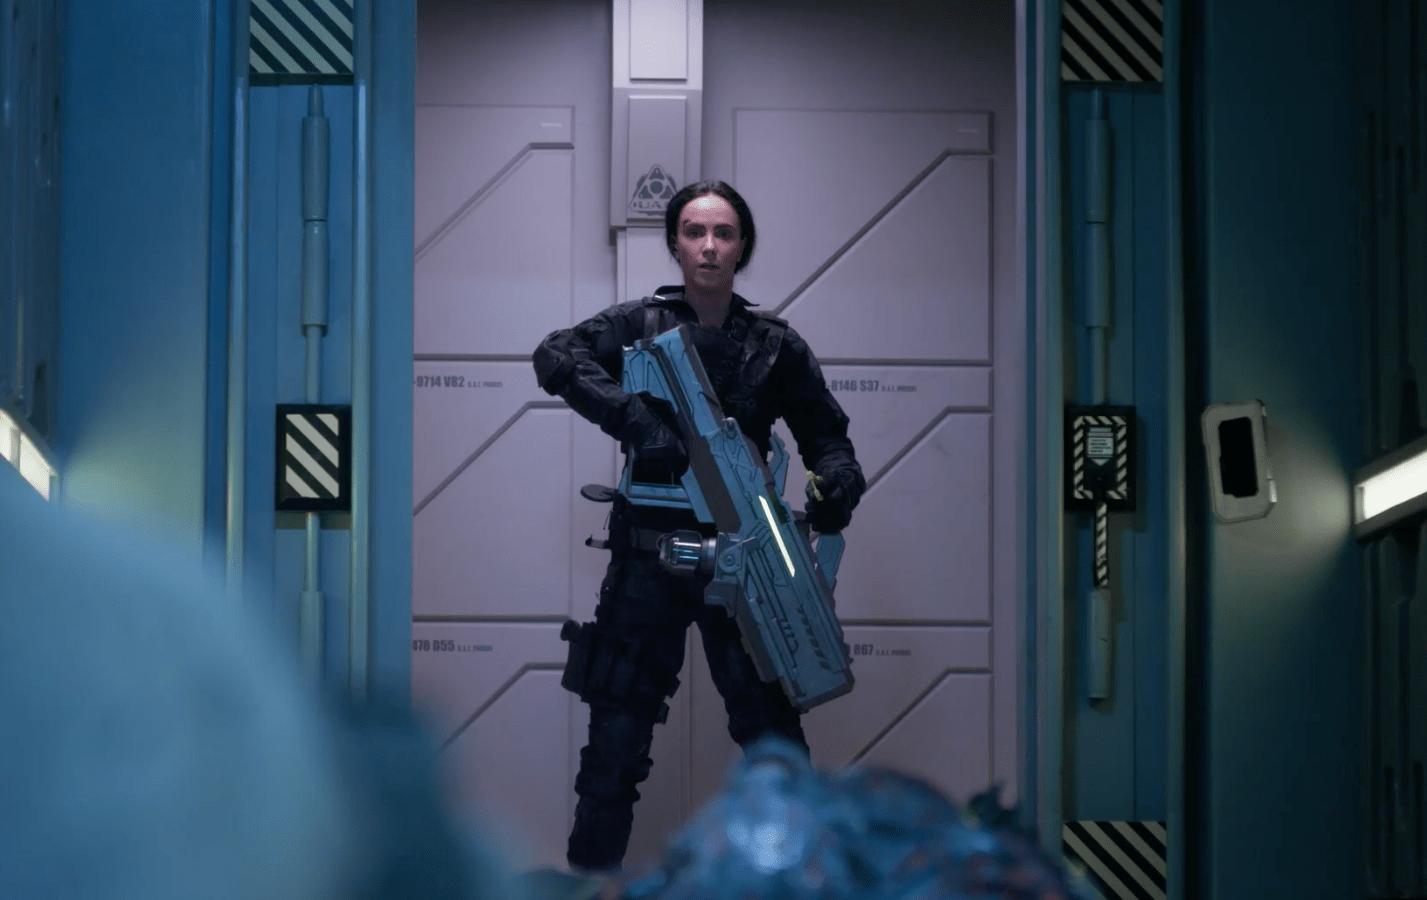 [Review] Satisfying B-Movie 'Doom: Annihilation' Makes 2005's 'Doom' Look Even Worse - Bloody Disgusting